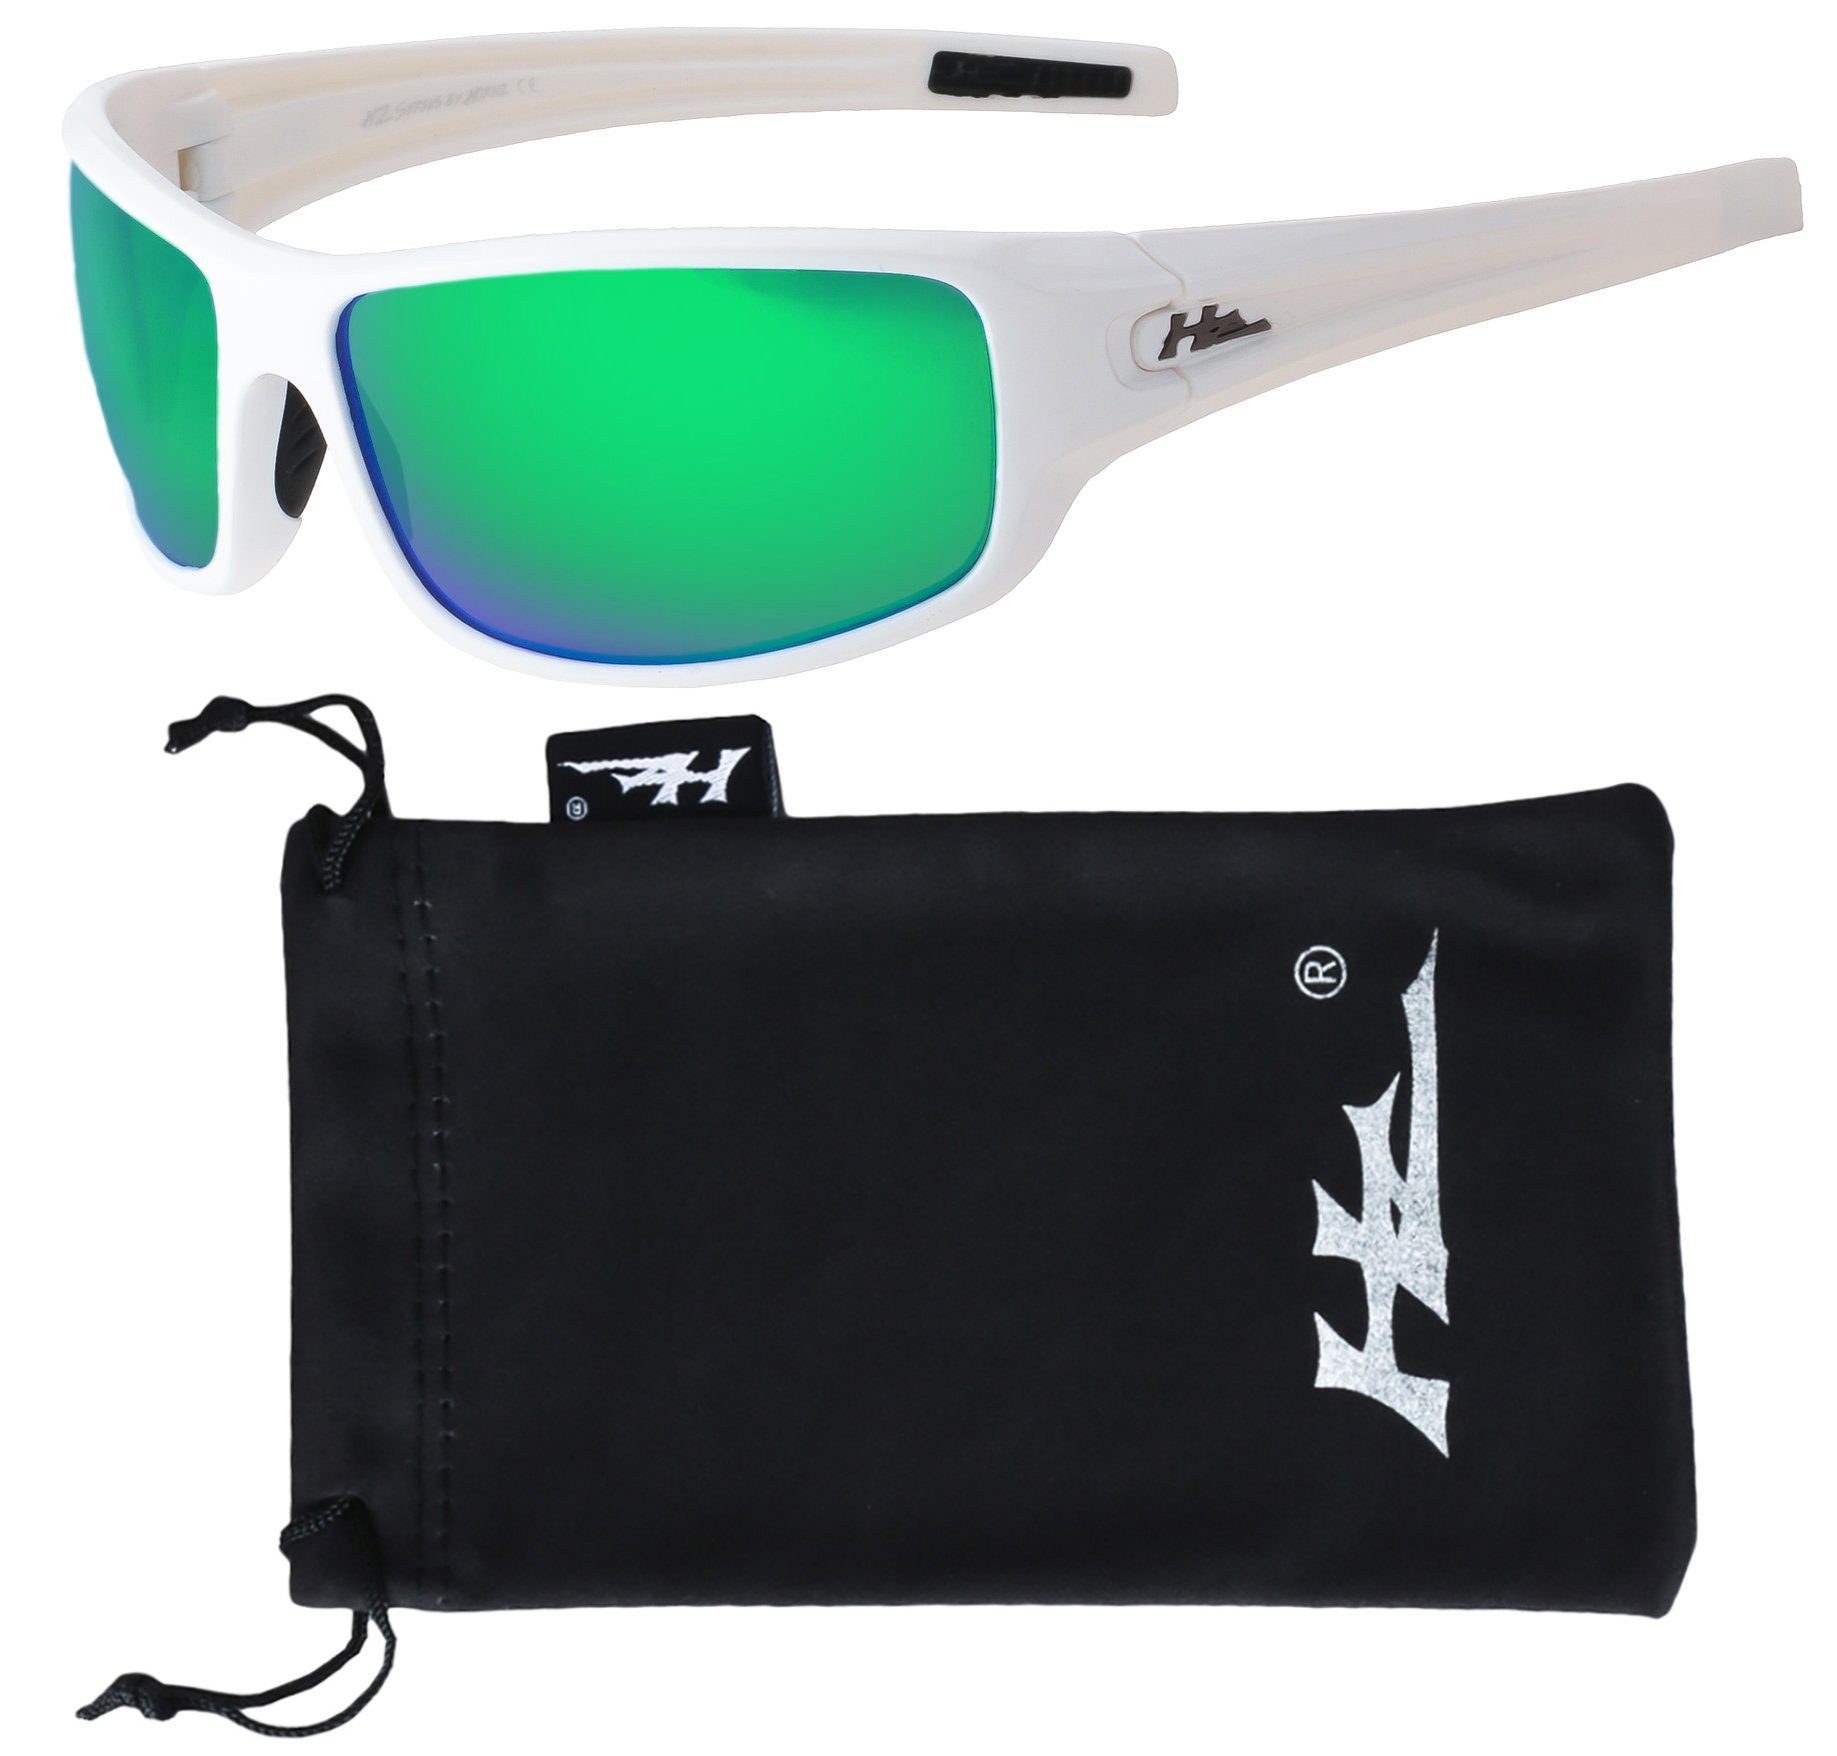 HZ Series Arkana - Premium Polarized Sunglasses by Hornz (Gloss White, Emerald Green Mirror)